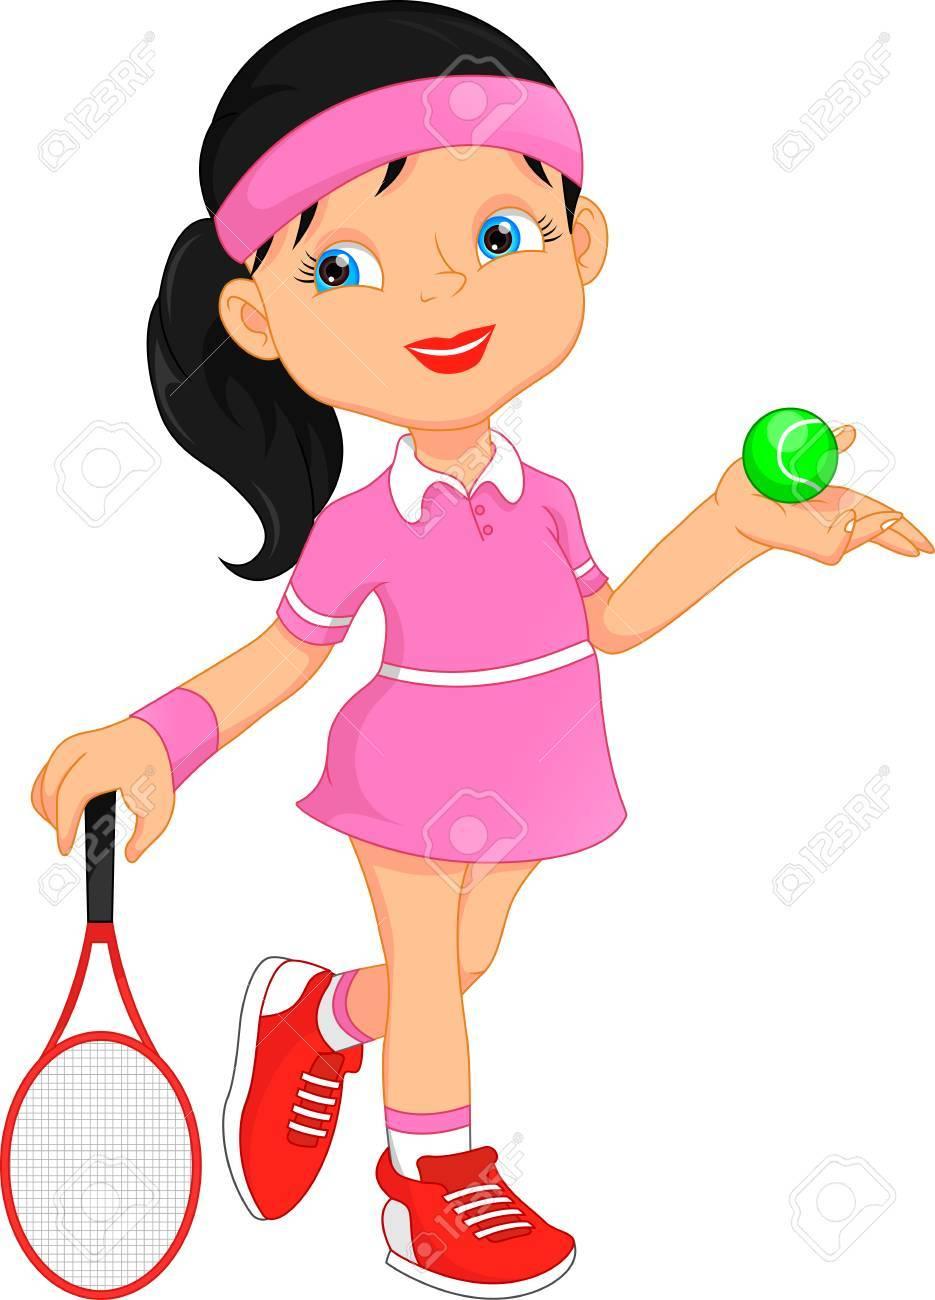 girl tennis player cartoon.